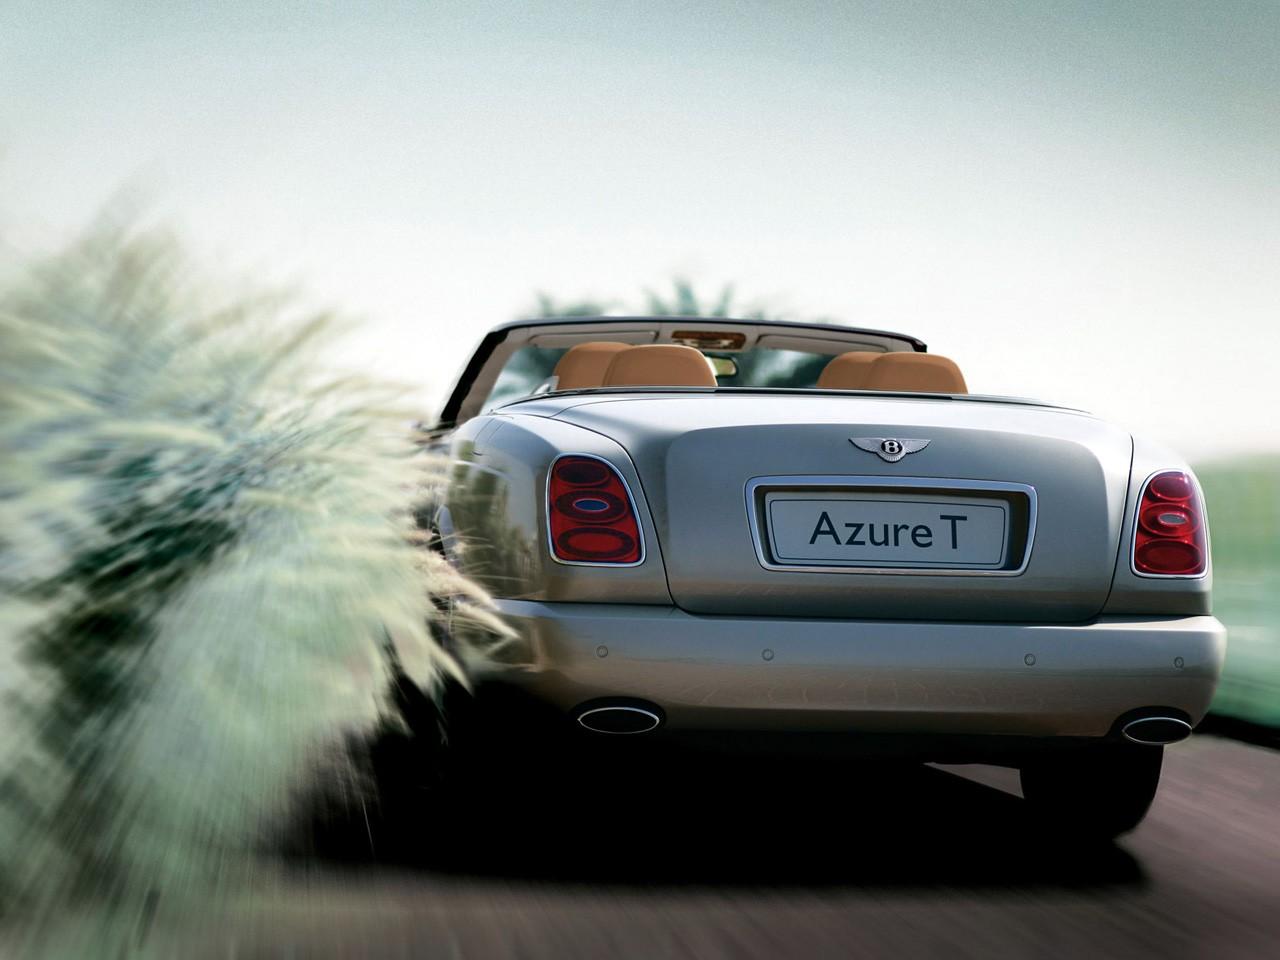 Bentley azure t specs 2008 2009 2010 2011 autoevolution bentley azure t 2008 2011 vanachro Choice Image